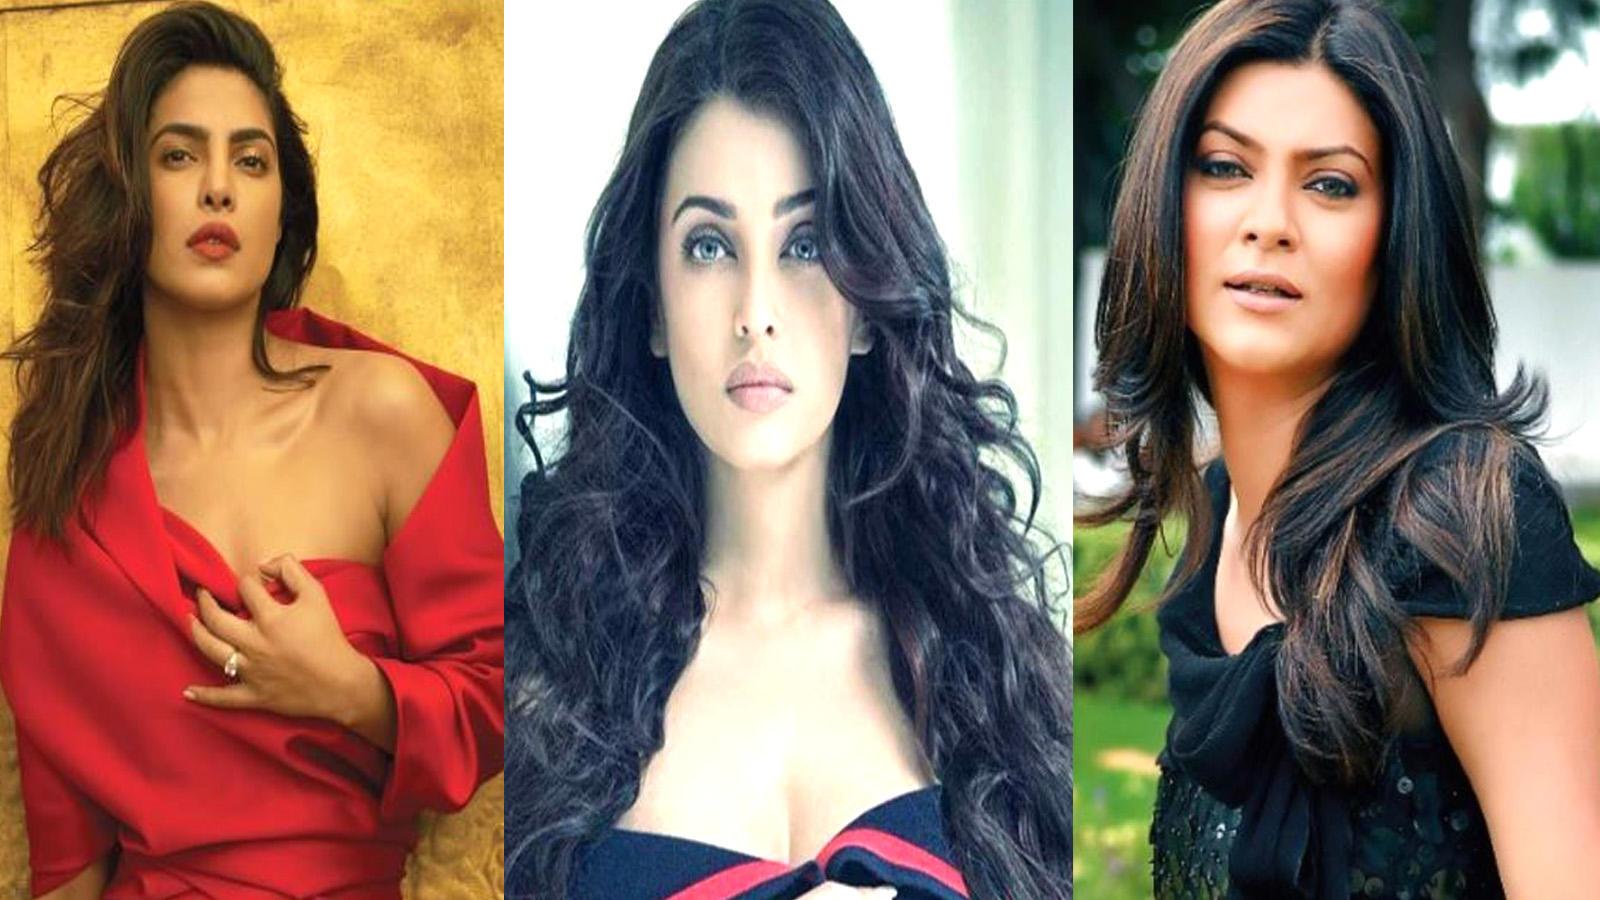 Sushmita Sen, Amitabh Bachchan, Shah Rukh Khan, Salman Khan, Deepika Padukone and Priyanka Chopra among 'World's Most Admired 2019'